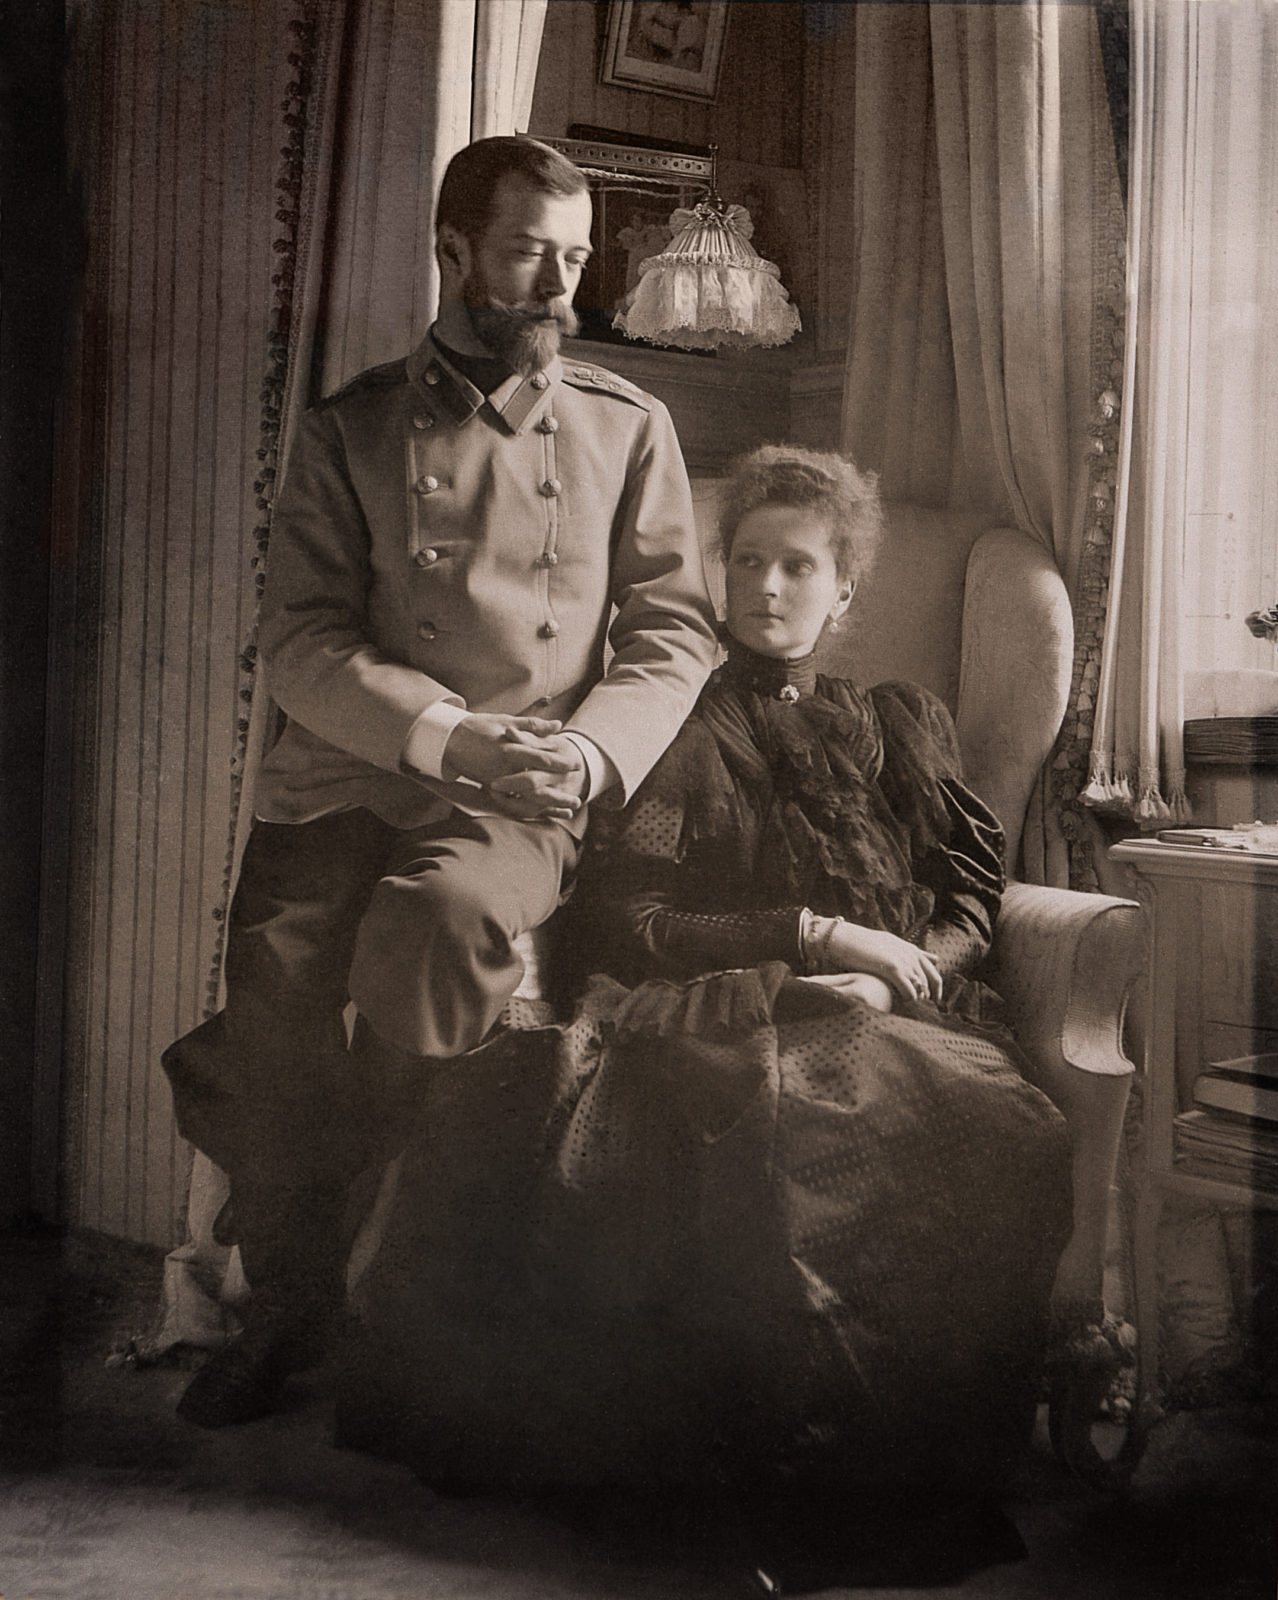 Still in love. Emperor Nicholas II and Empress Alexandra Feodorovna